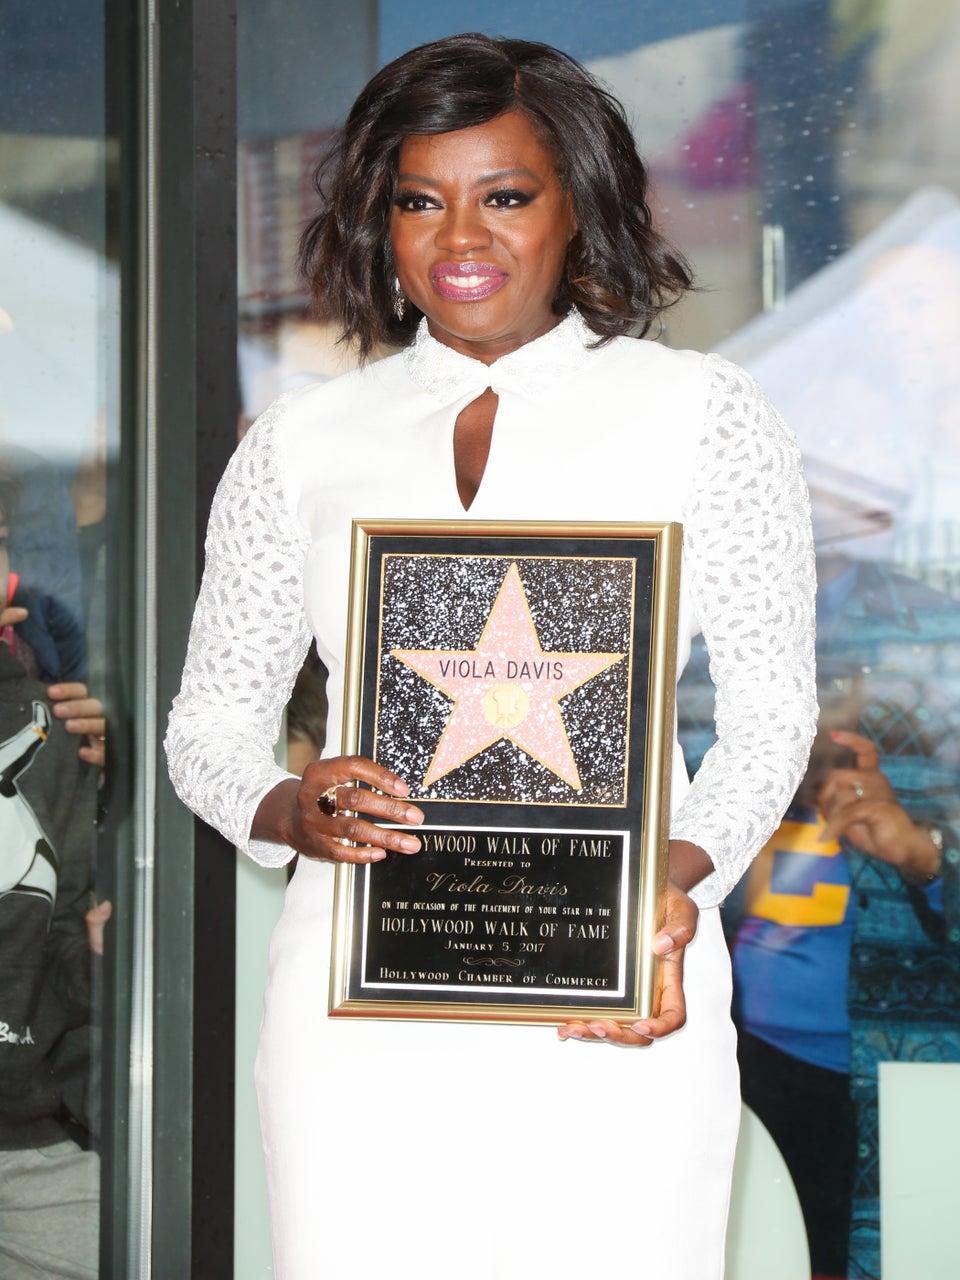 Viola Davis Got a Star on the Hollywood Walk of Fame